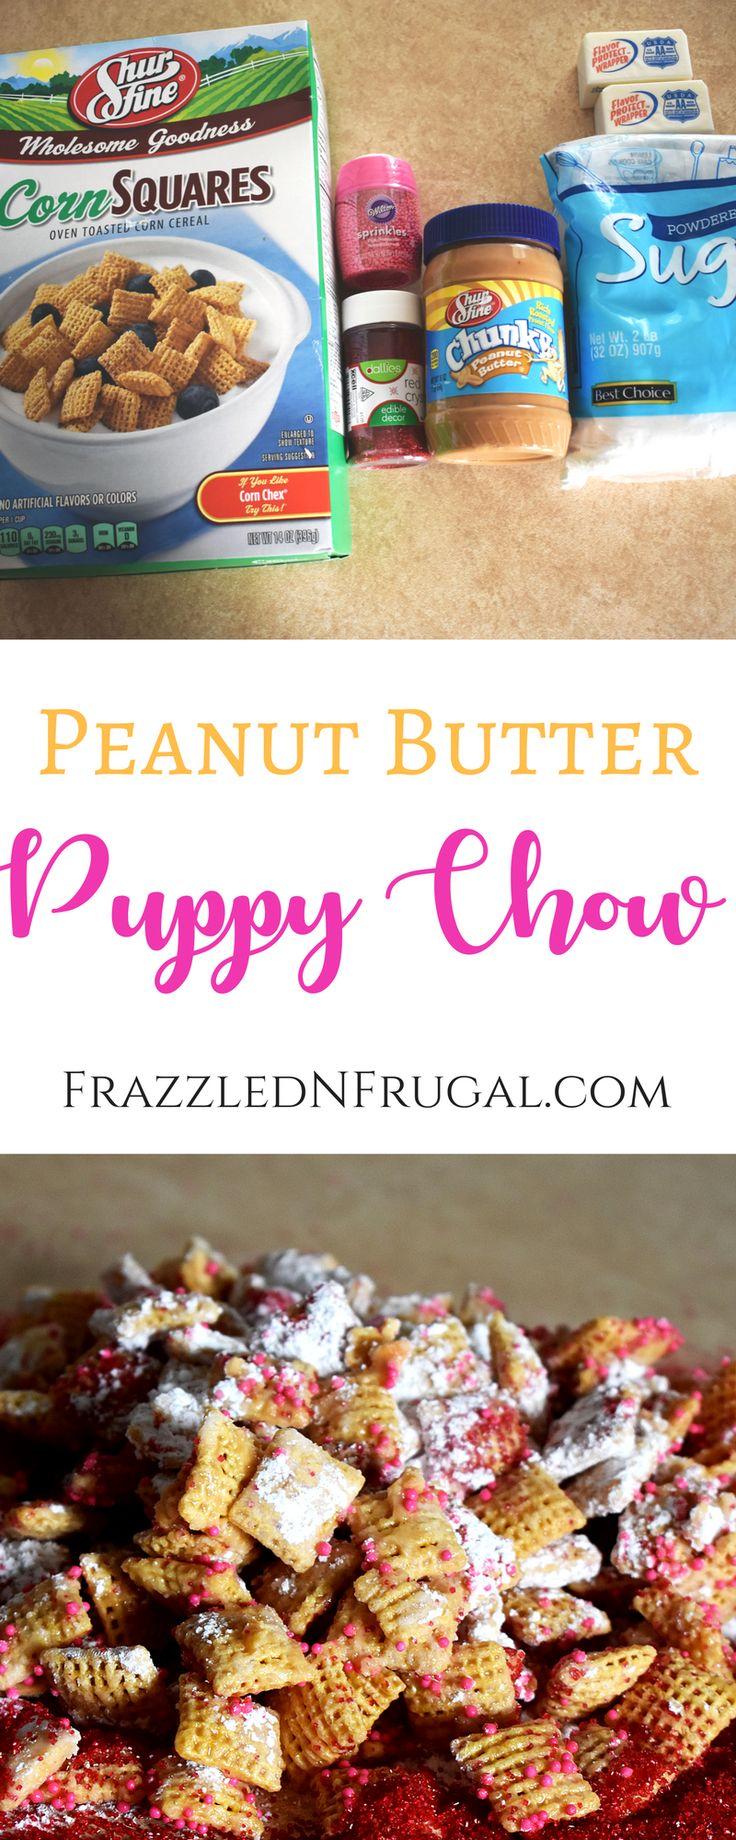 Peanut Butter Puppy Chow Recipe